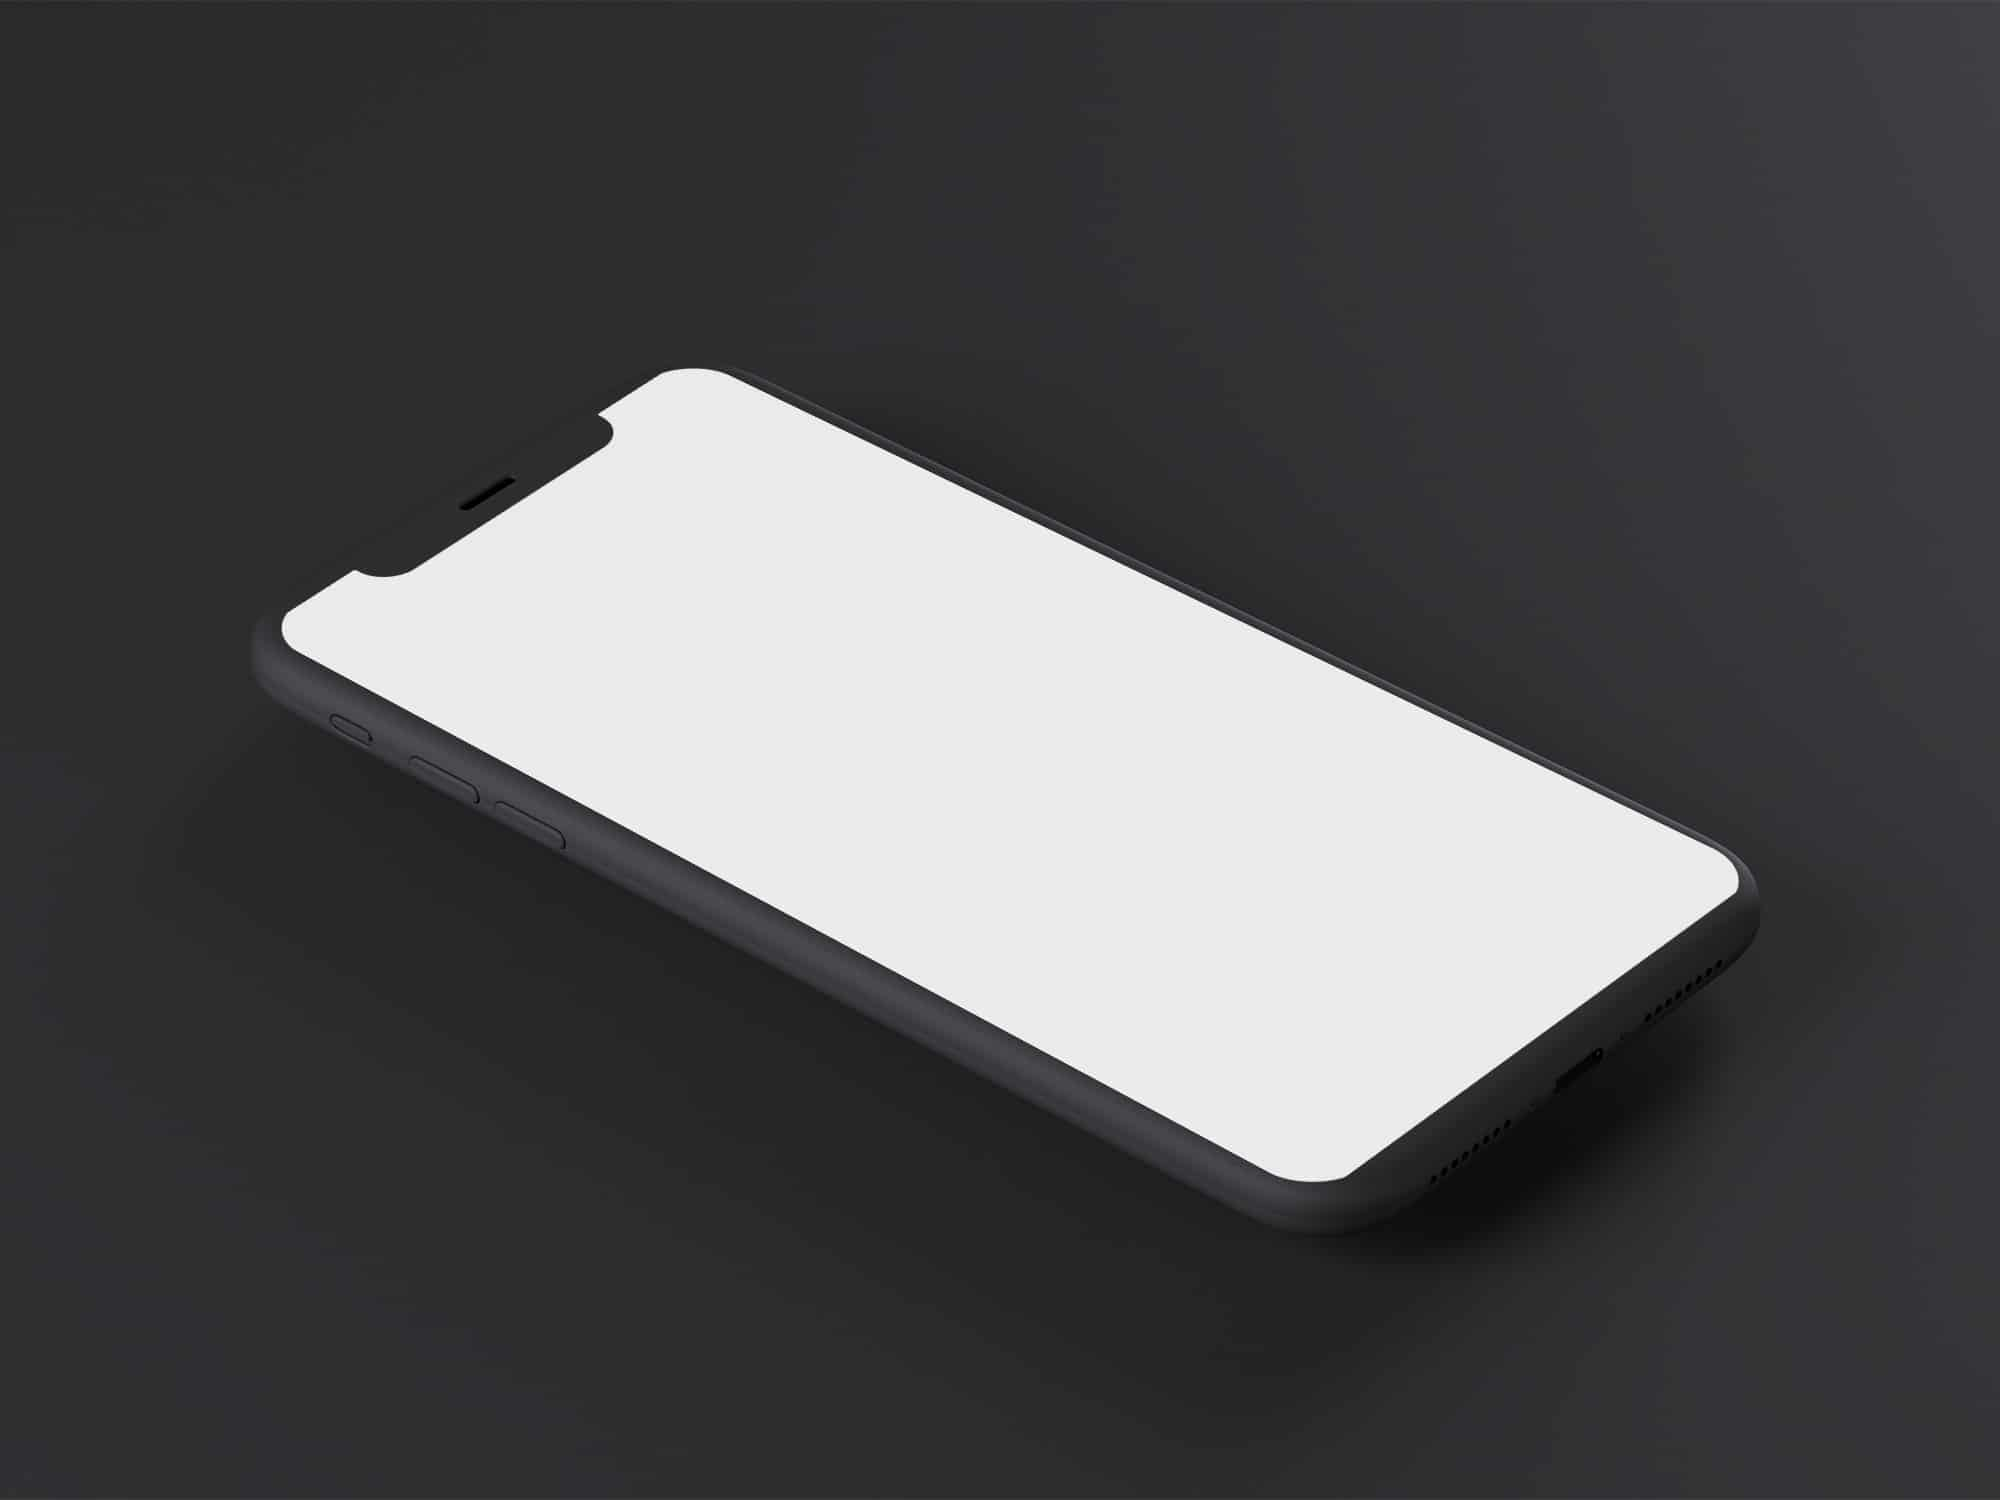 iPhone x Minimal Mockup